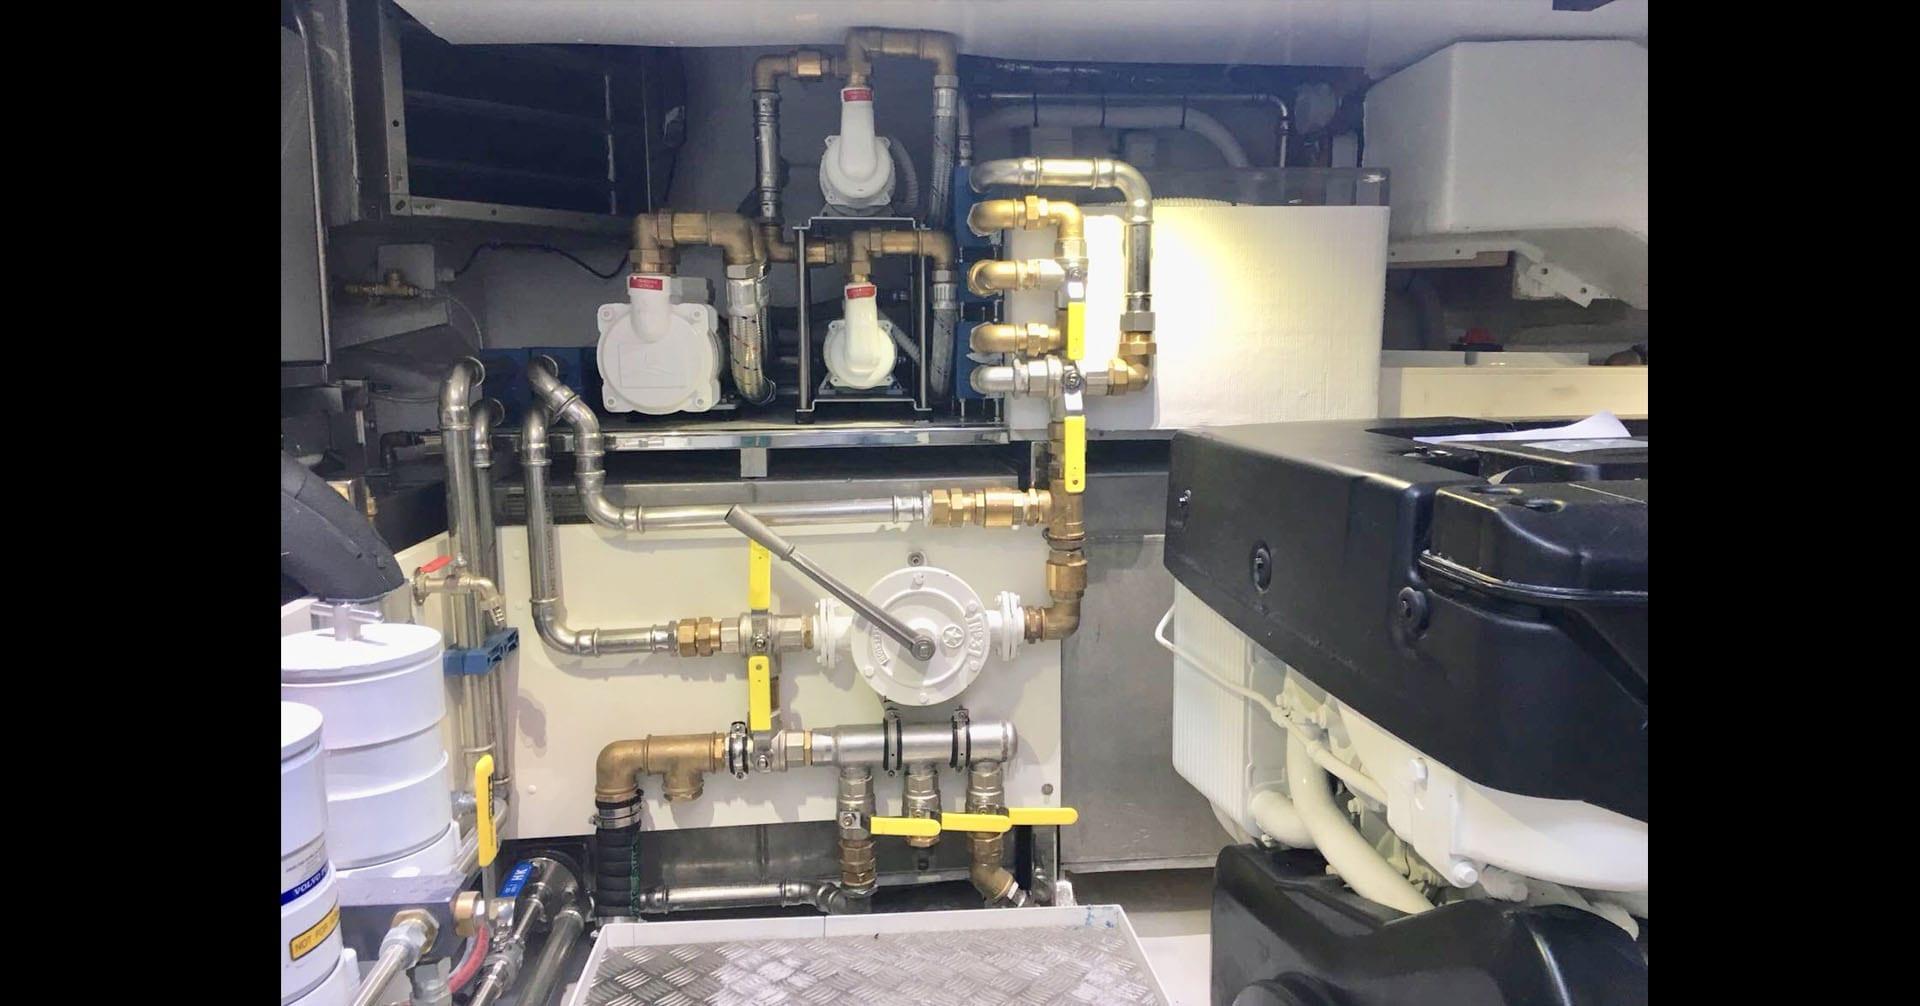 uniesse-ss-6-engine-room14